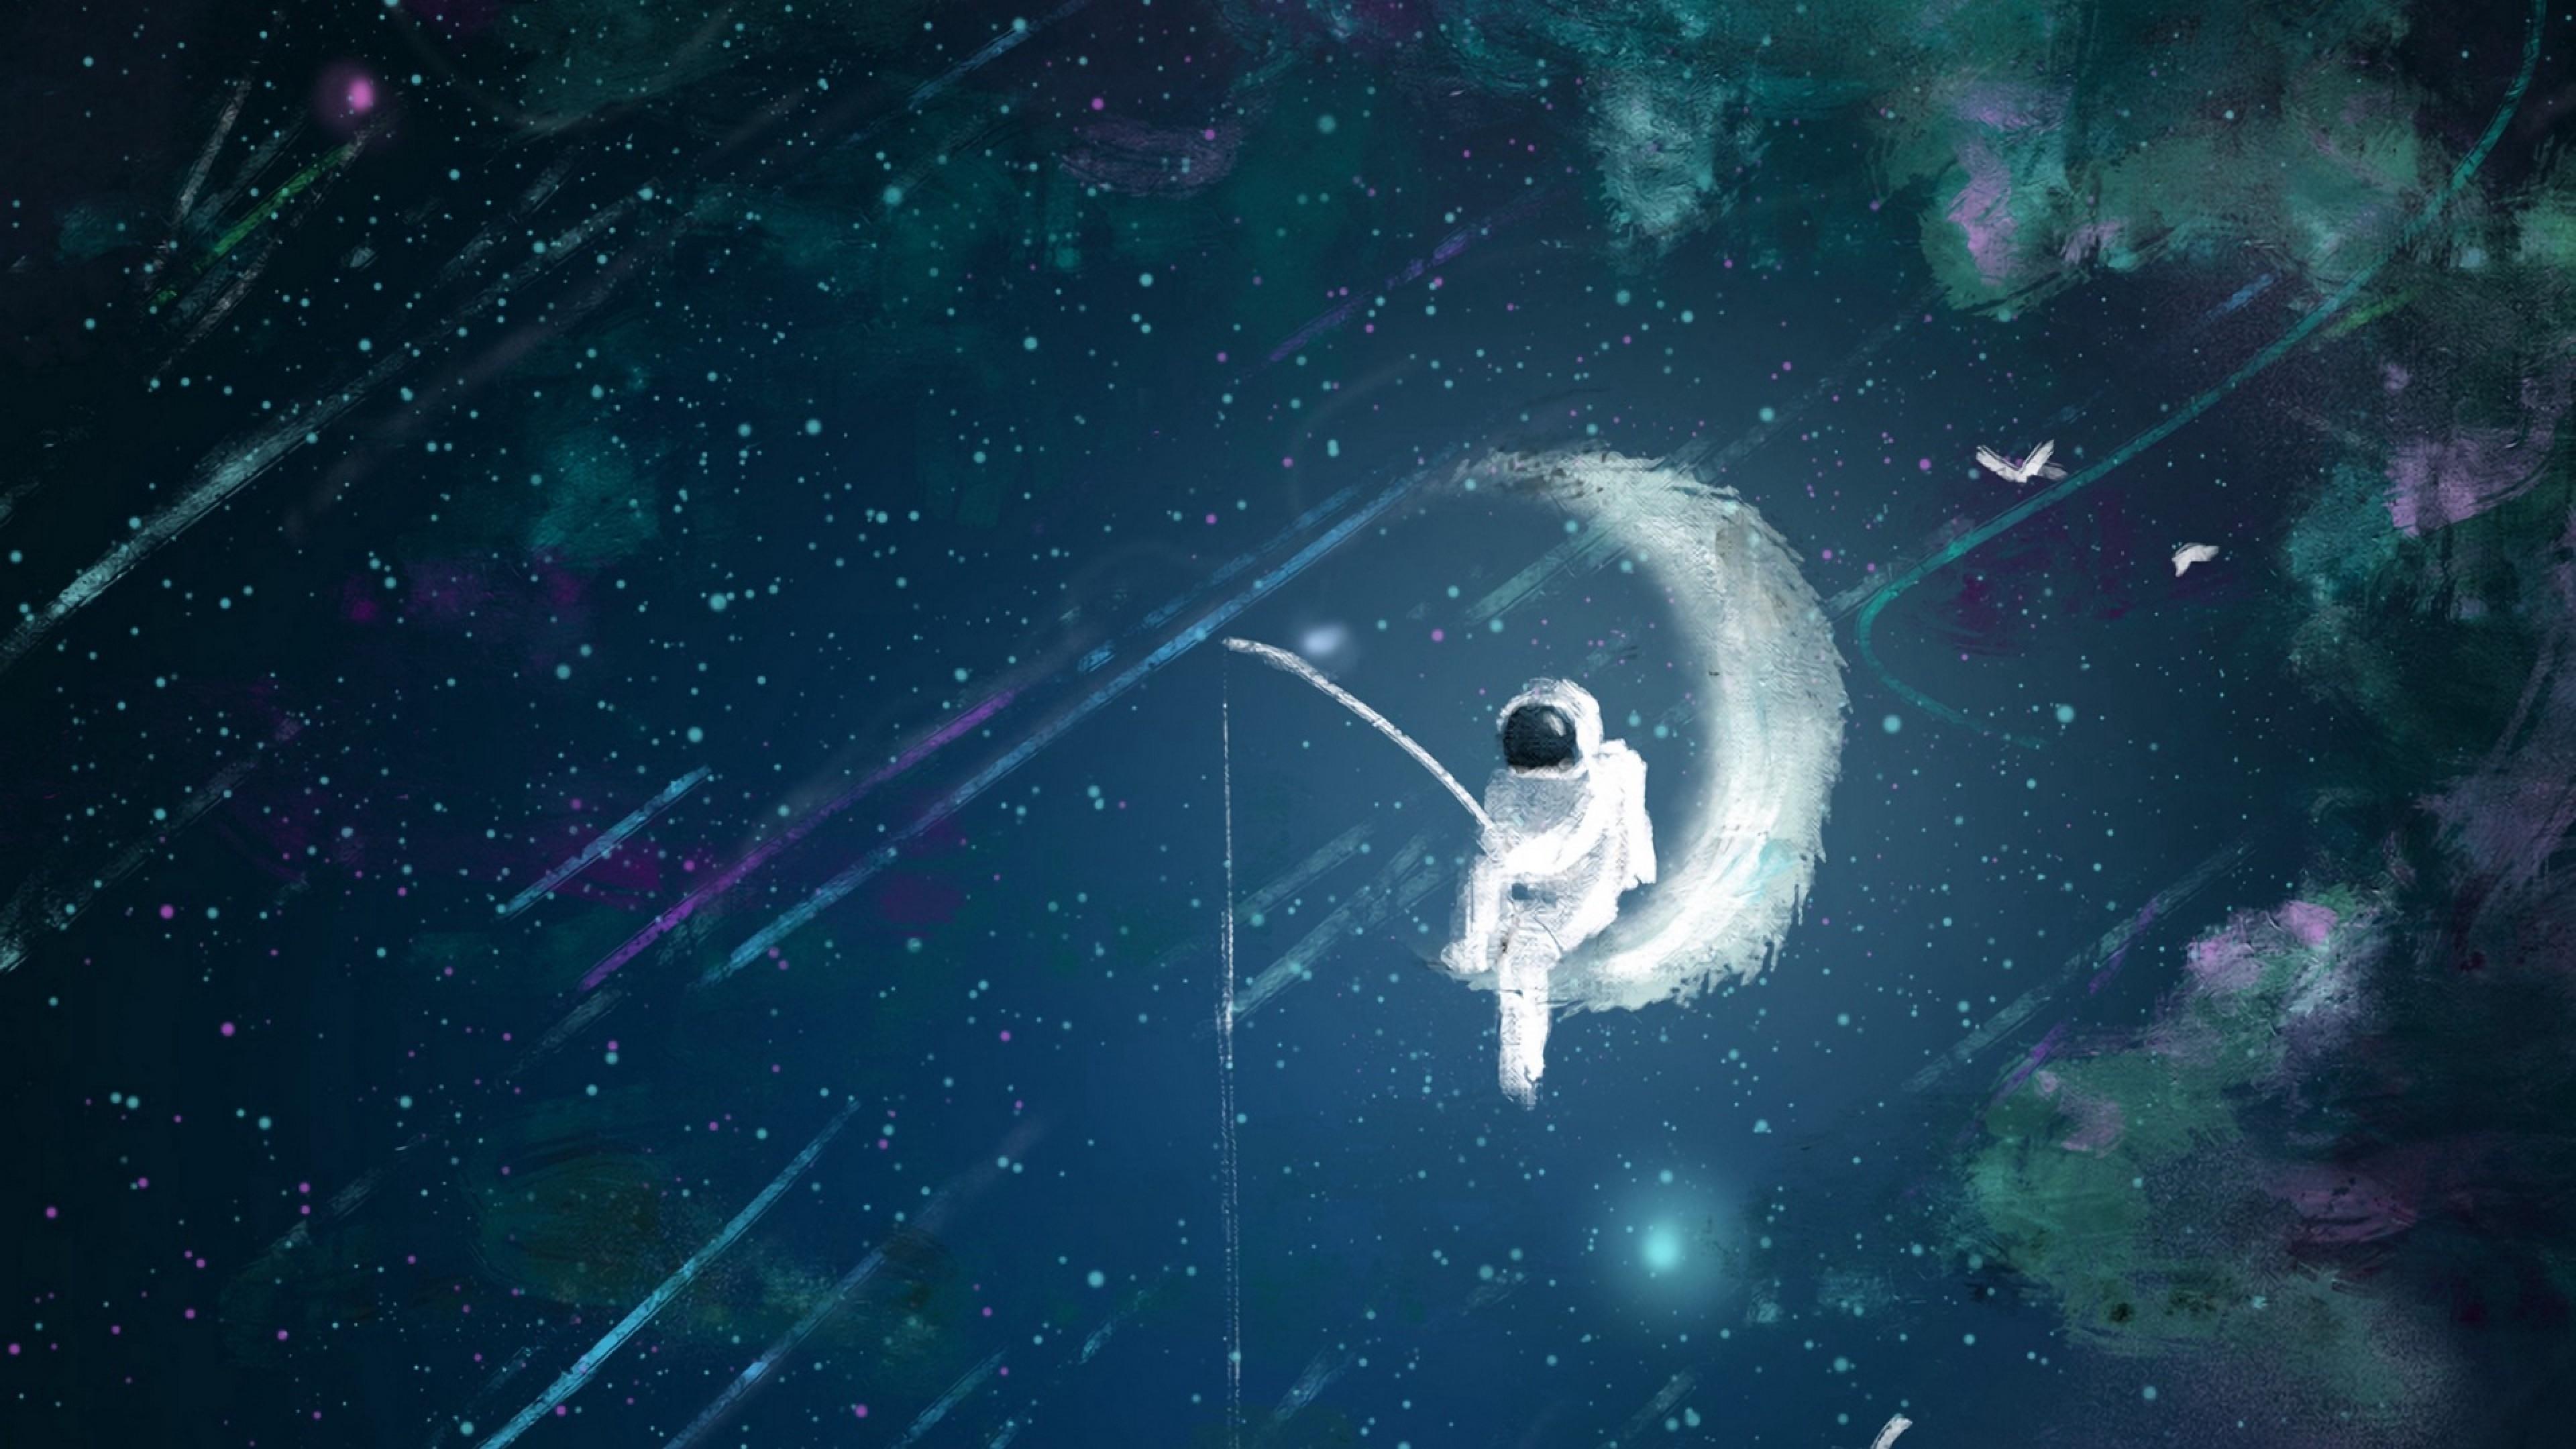 Wallpaper Astronaut Moon Fishing Art 2560x1440 Wallpaper Teahub Io